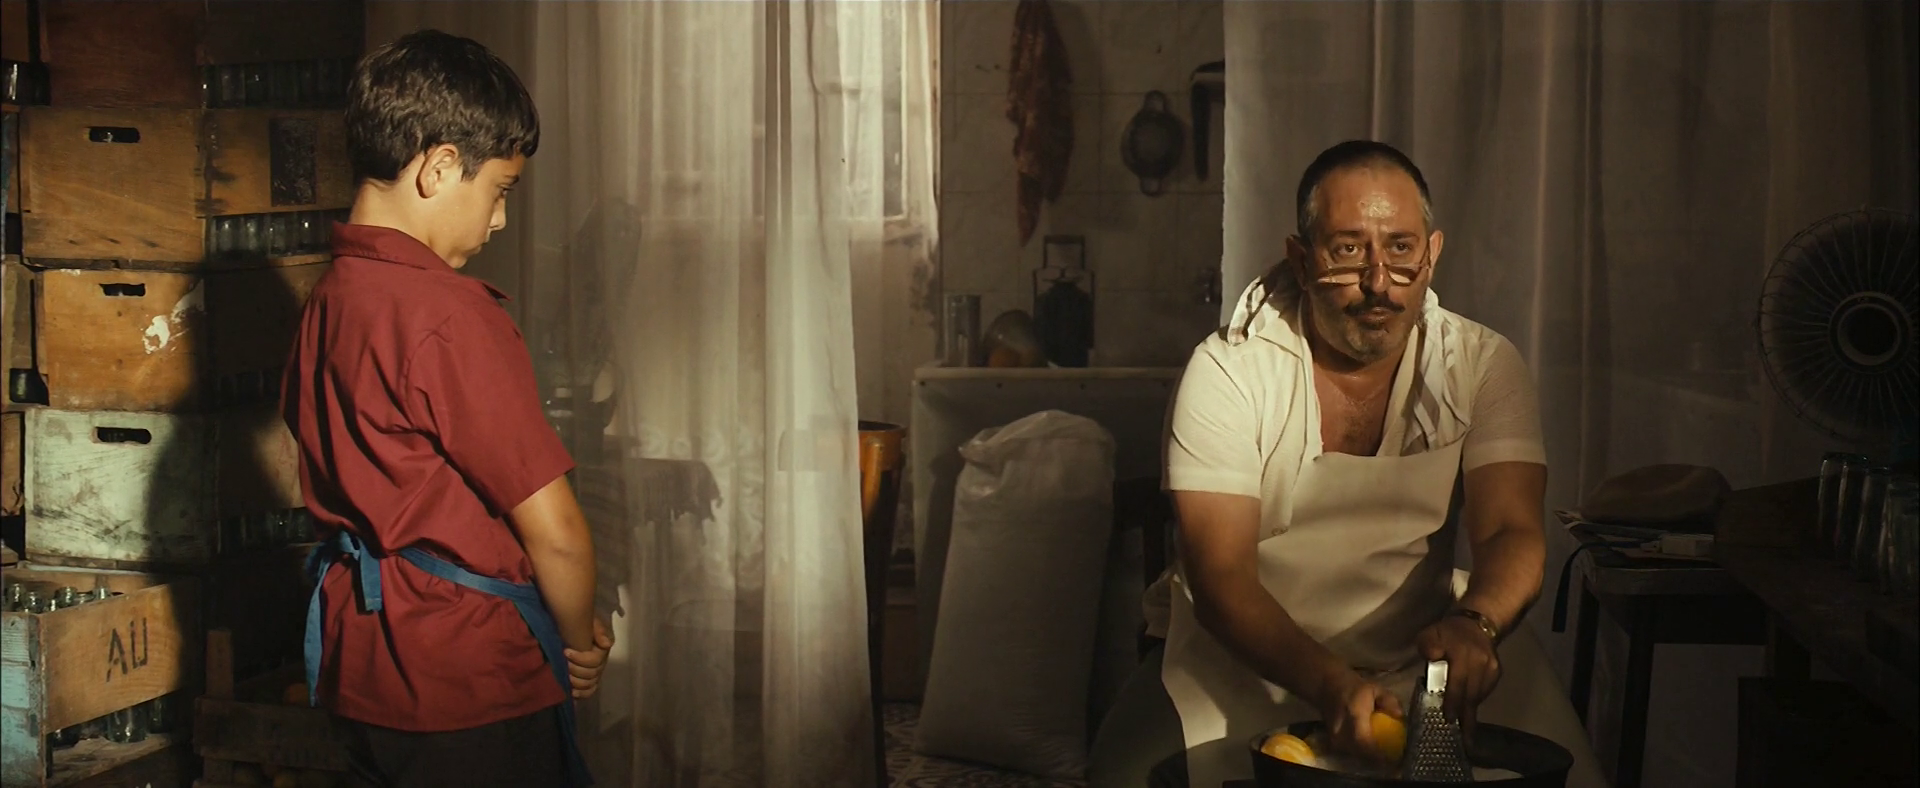 İftarlık Gazoz 2016 HDTVRip XViD SANSÜRSÜZ Yerli Film - Tek Link Film indir